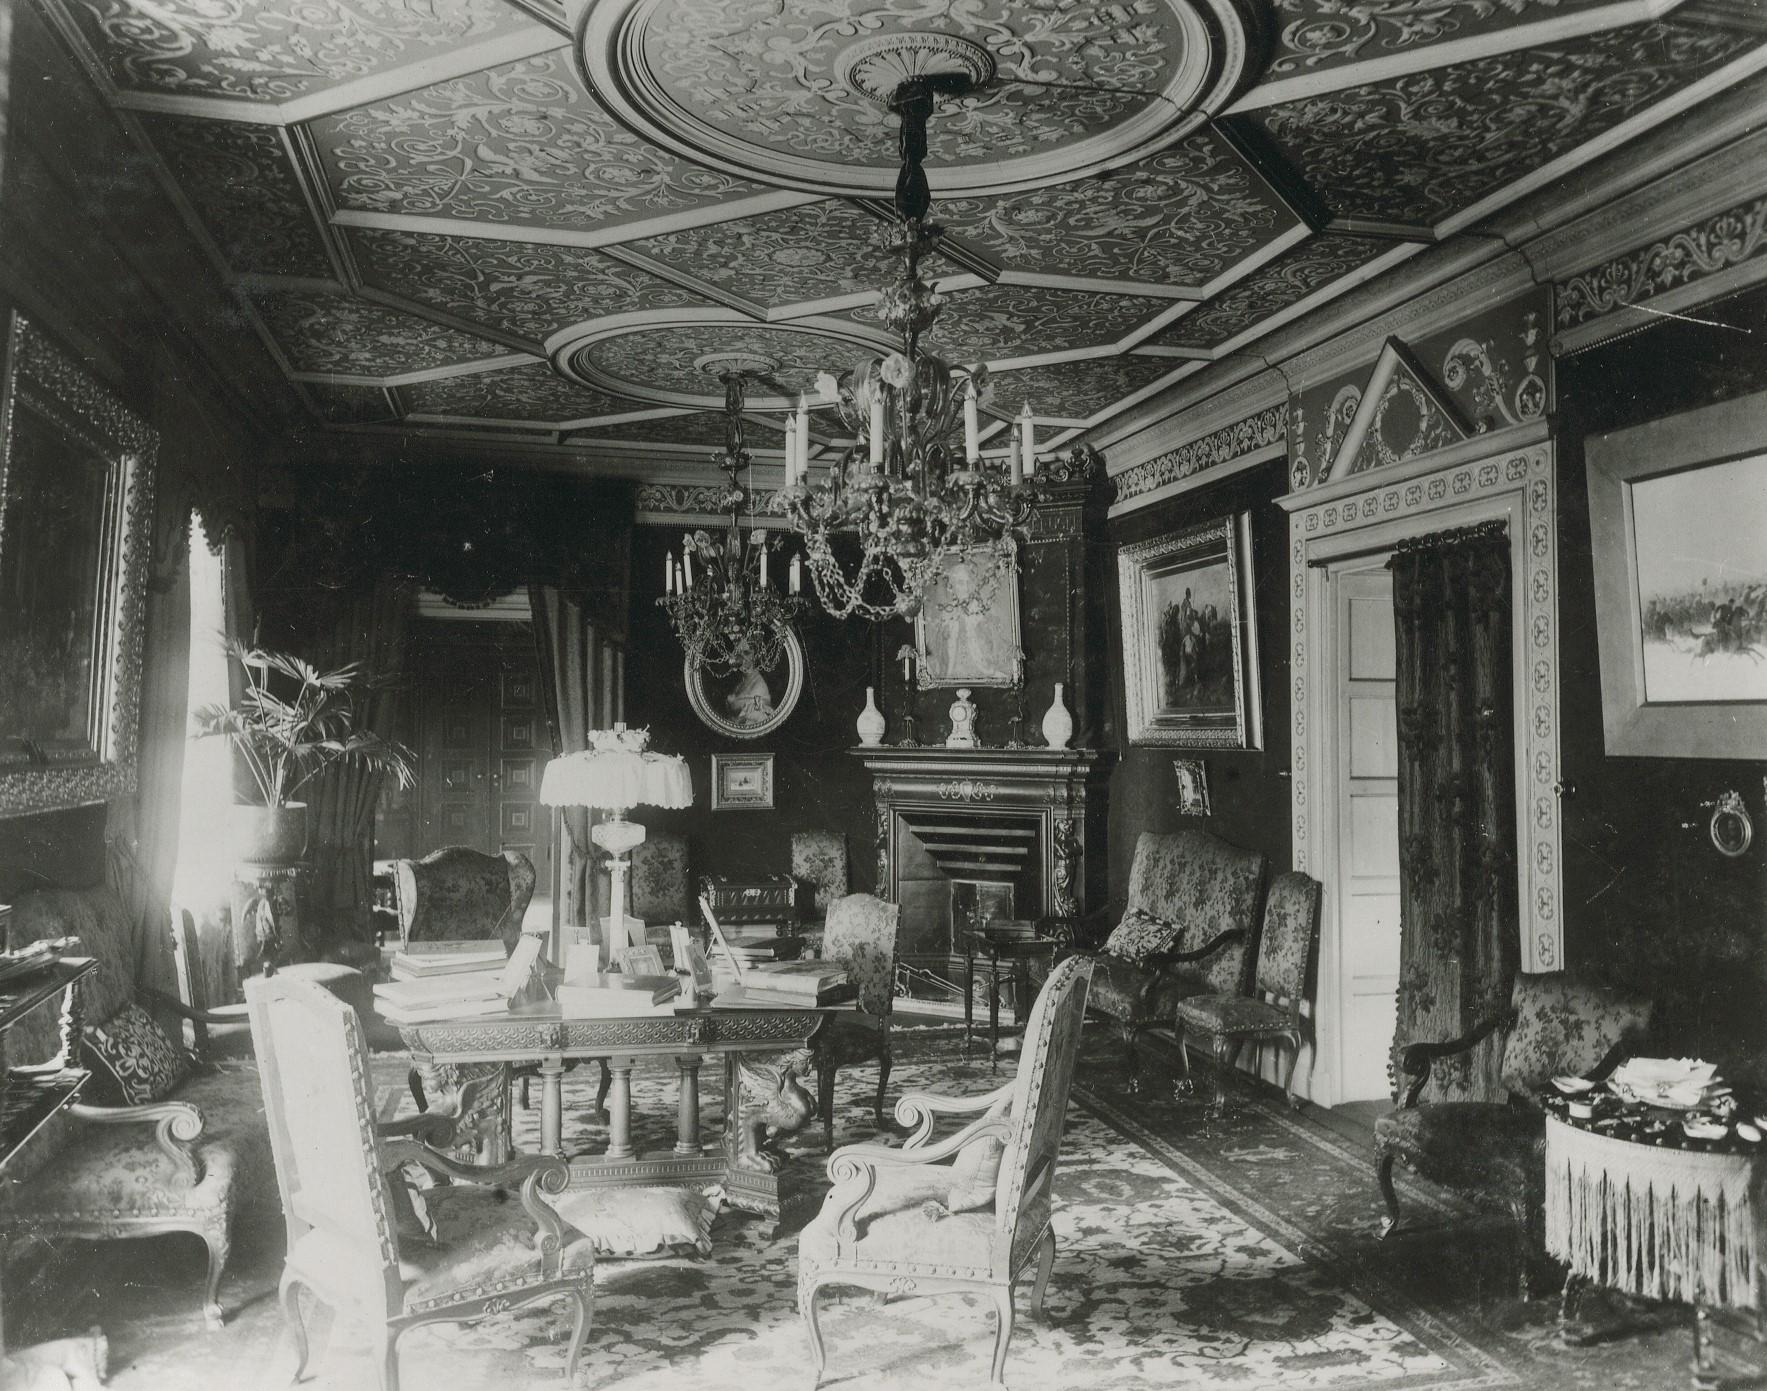 Bostäder 1890tal, sid. 029 , Gråark